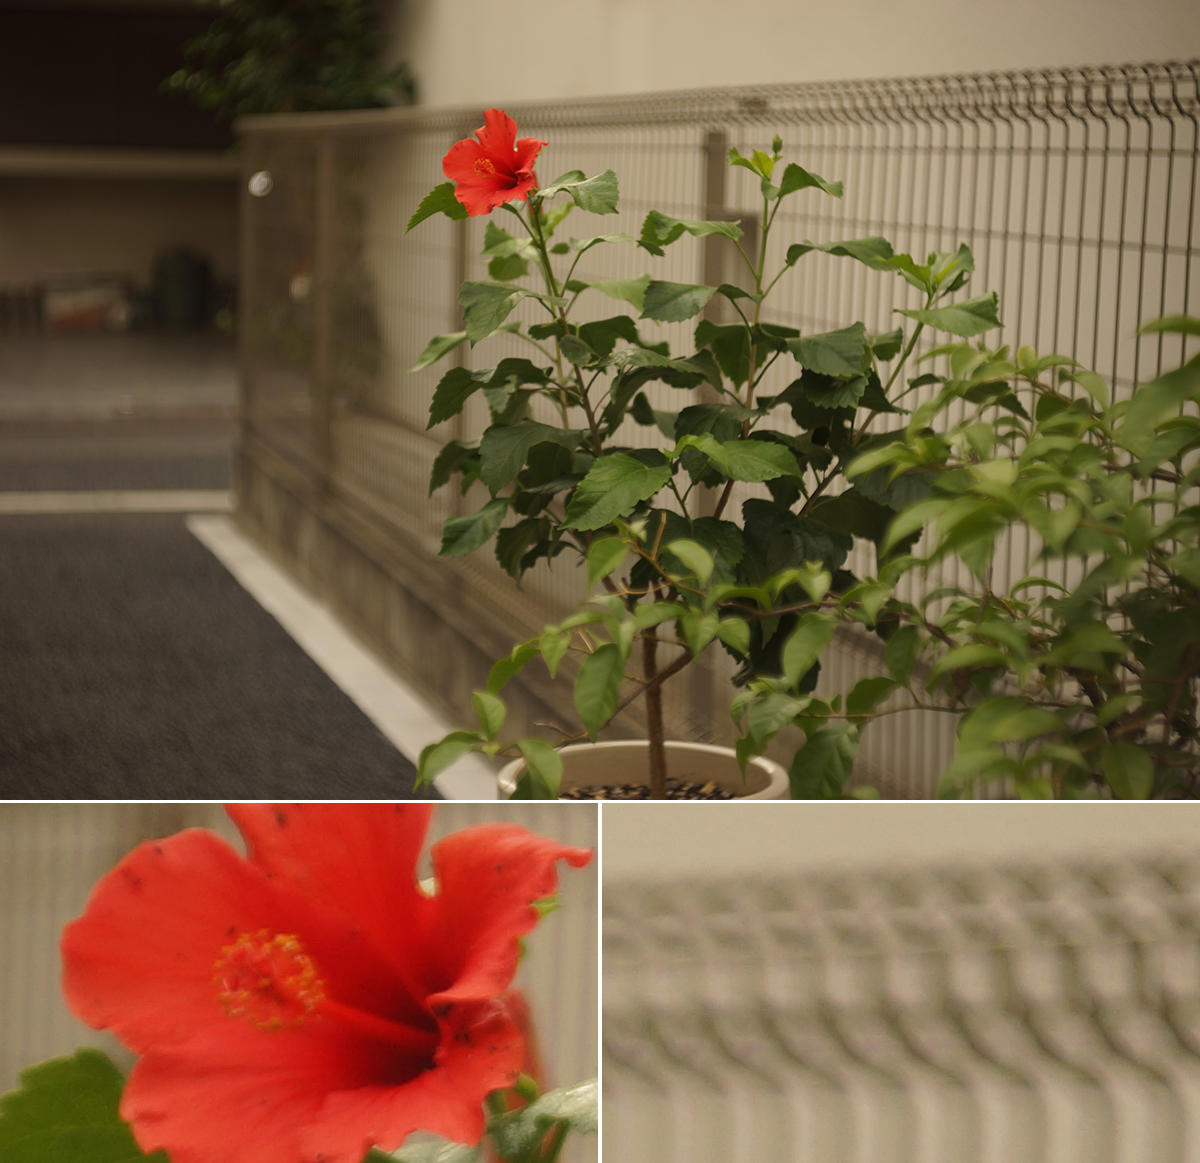 50mm_011_002_4994